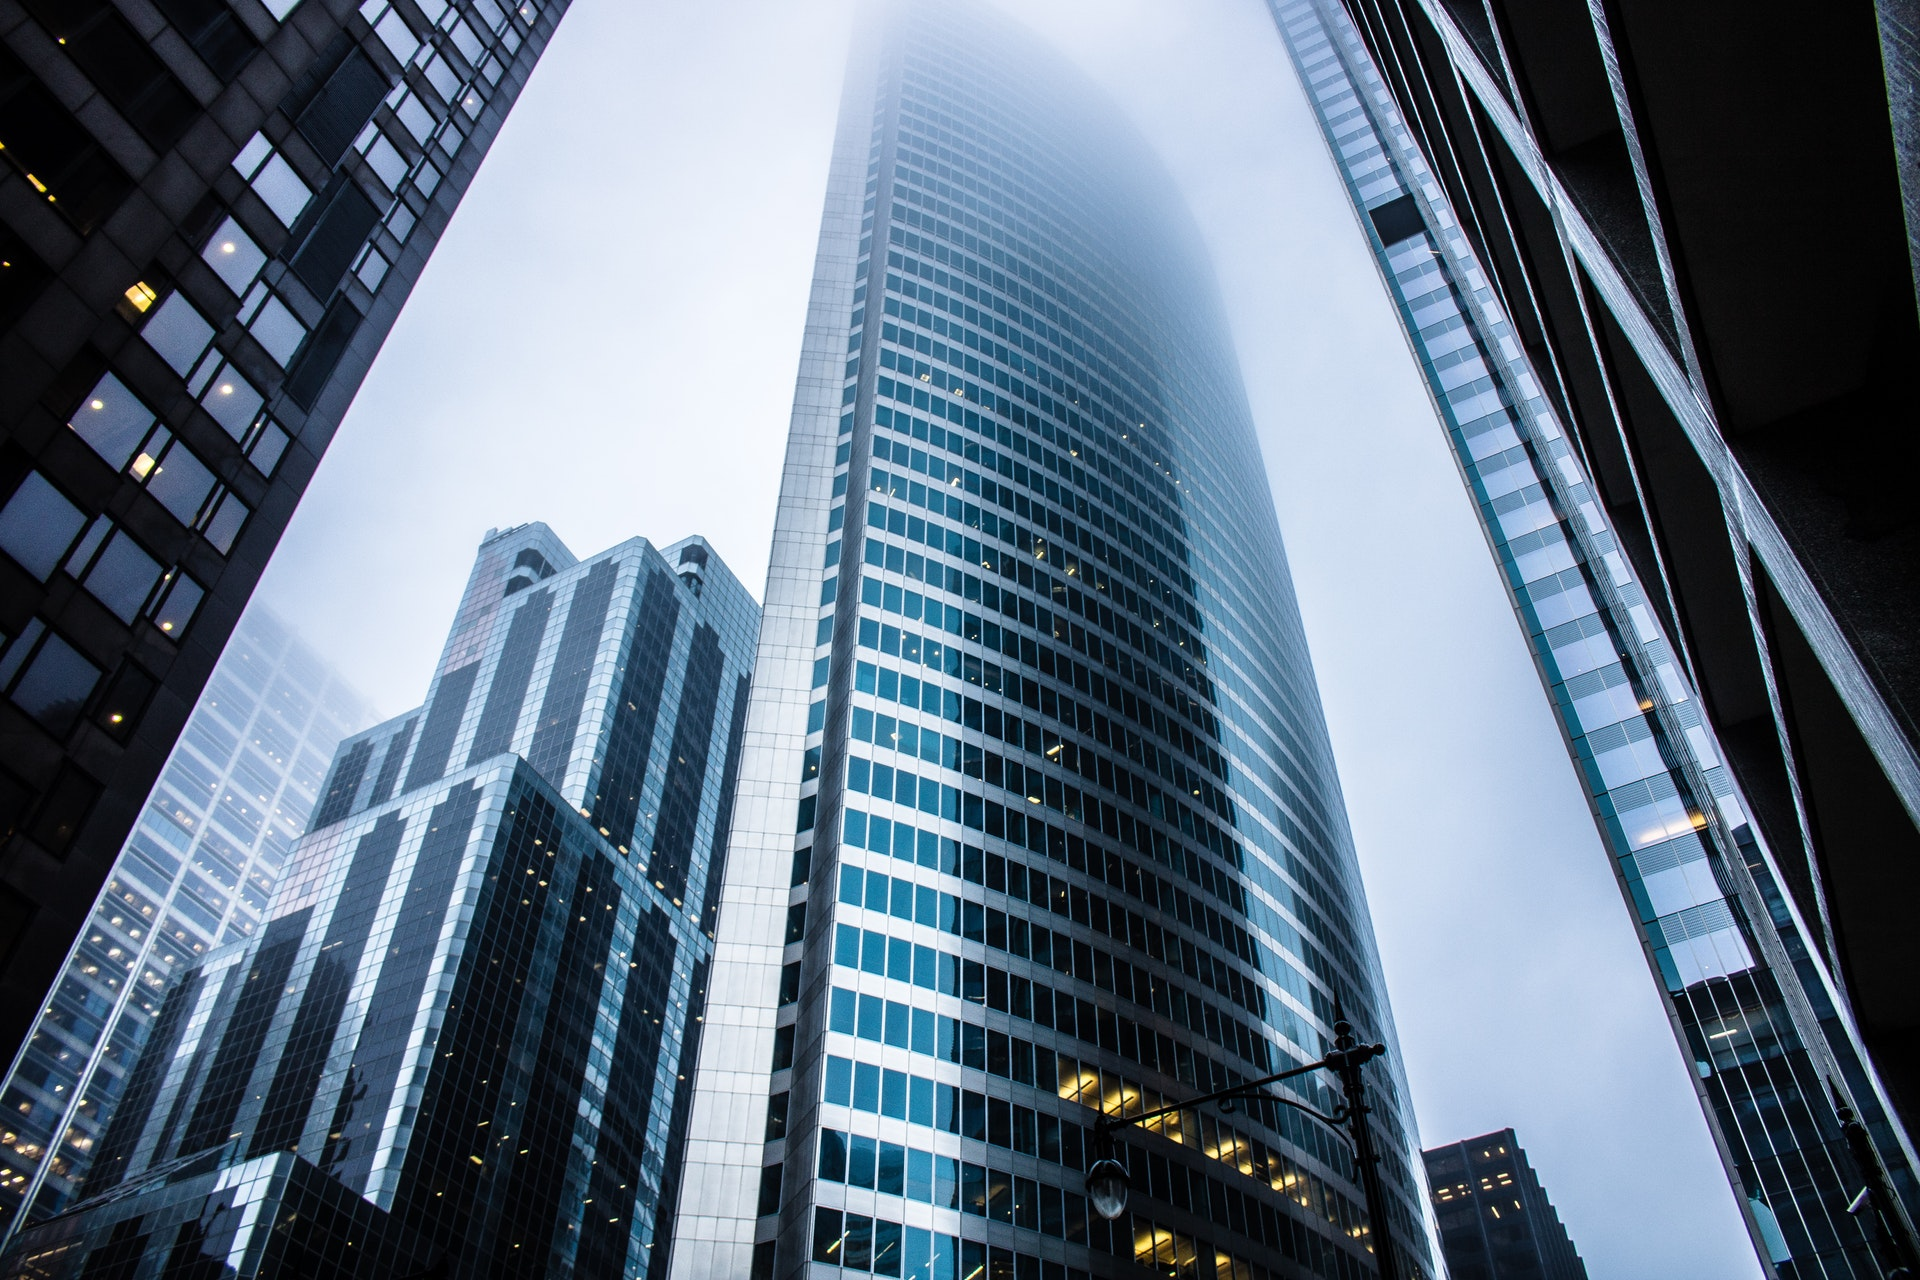 architectural-design-architecture-buildings-936722